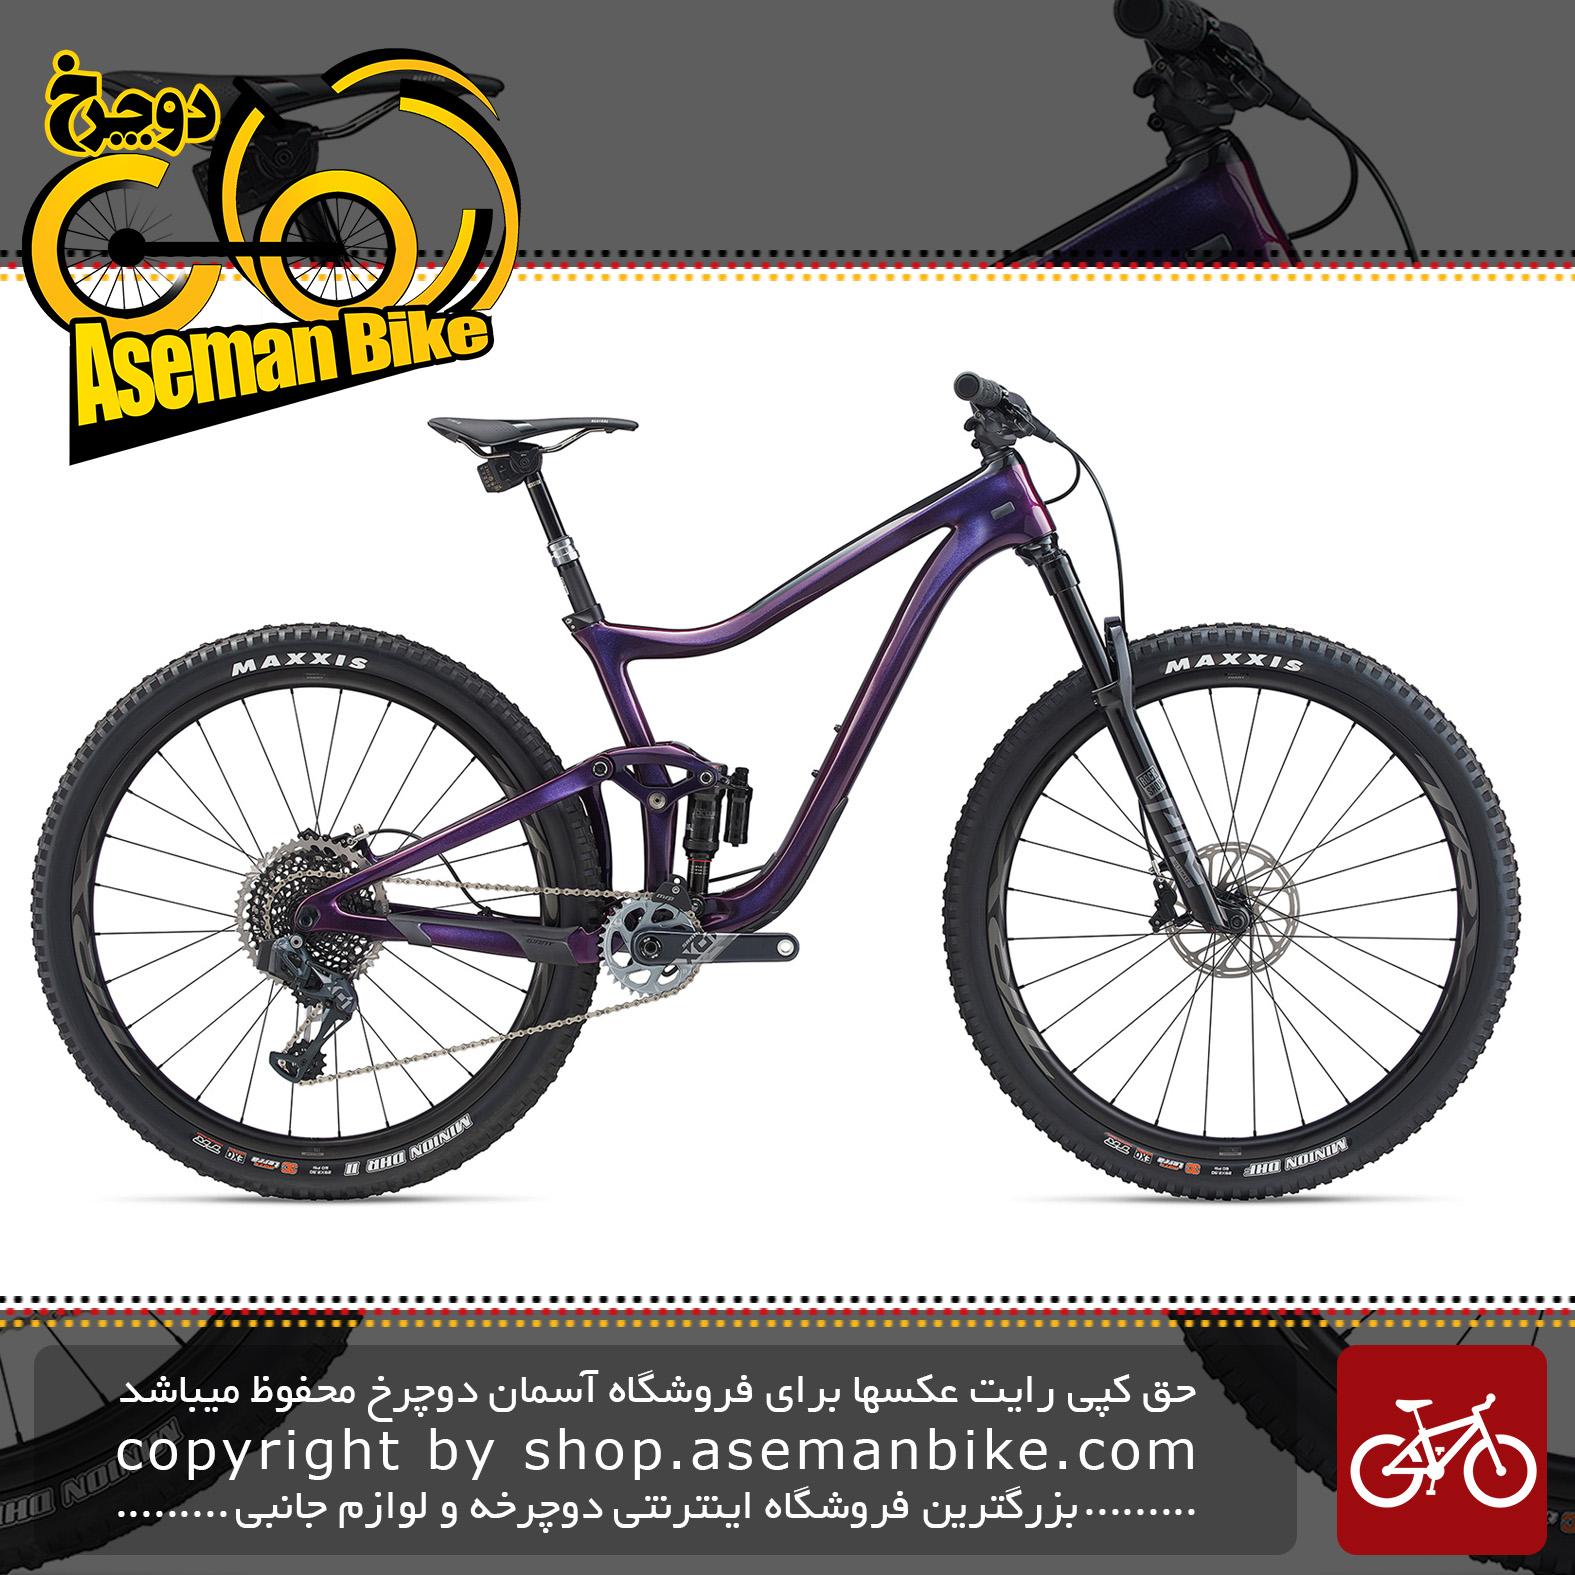 دوچرخه کوهستان جاینت مدل ترنس ادونس پرو 29 0 2020 Giant Mountain Bicycle Trance Advanced Pro 29 0 2020